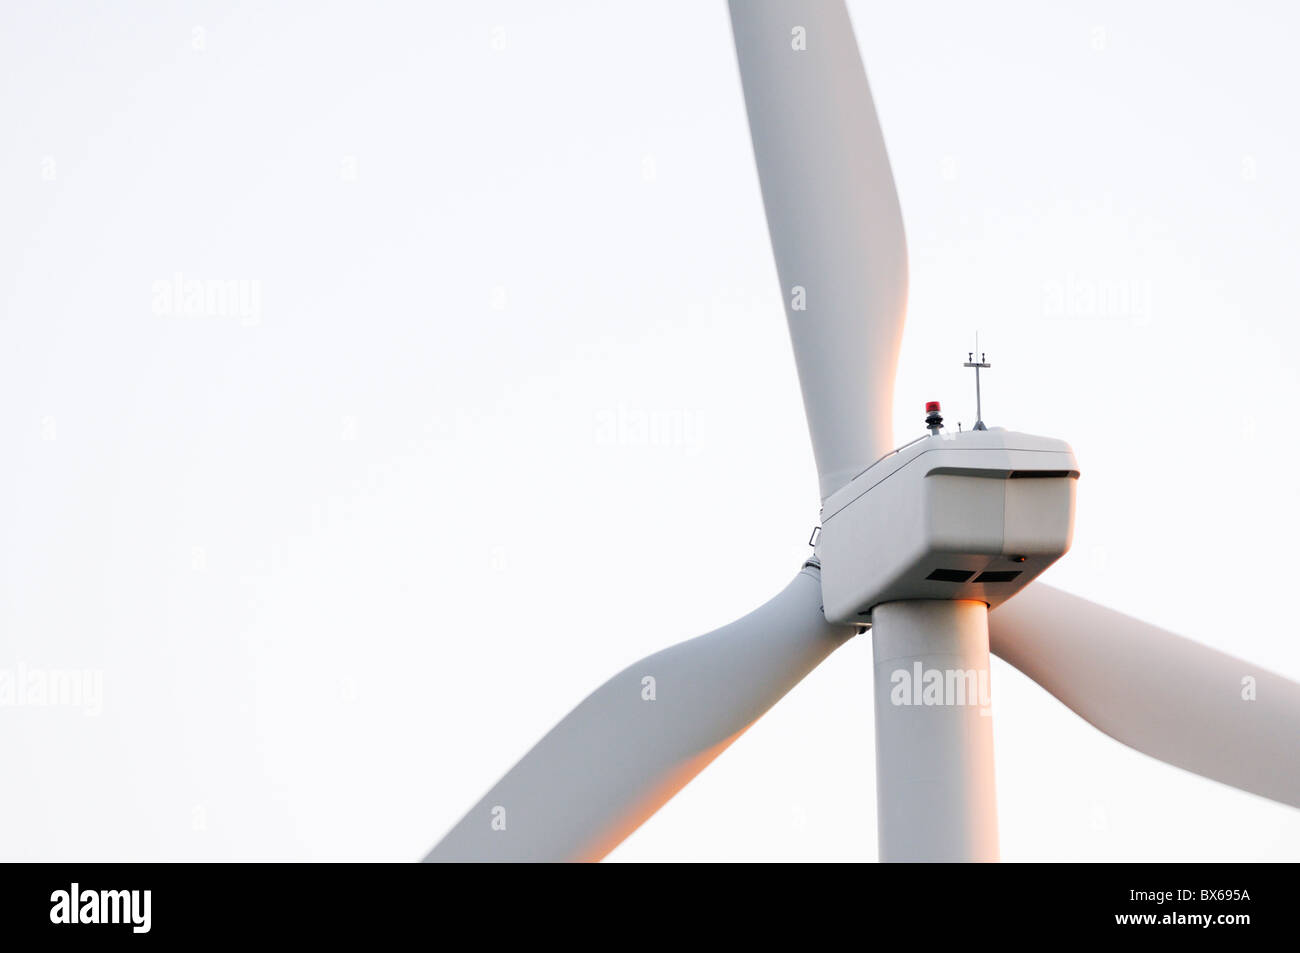 Wind-Turbine-Nahaufnahme Stockbild